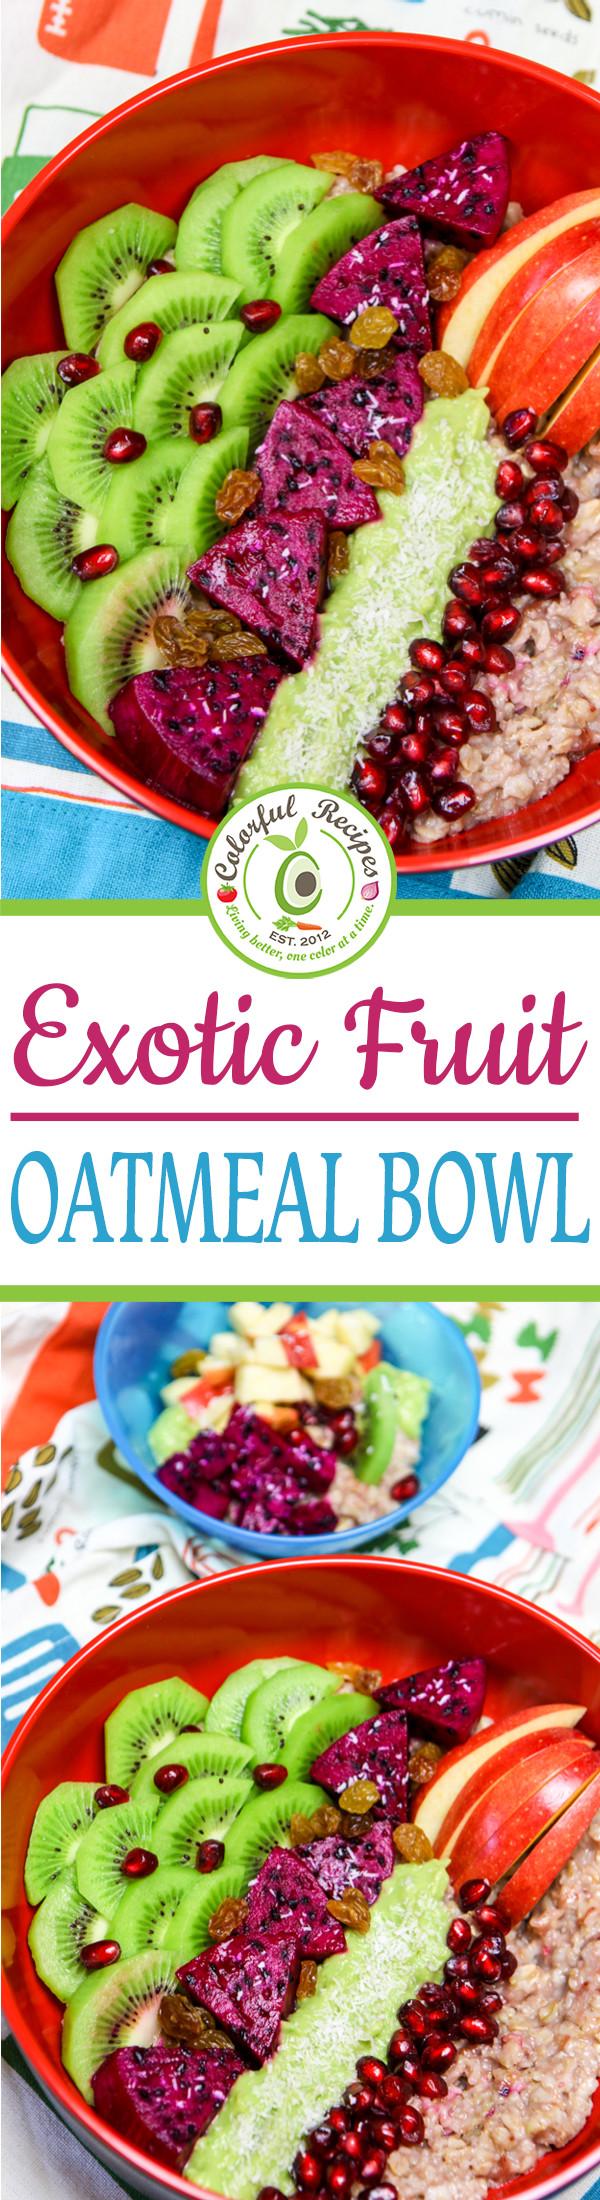 exotic-fruit-oatmeal-bowl-4